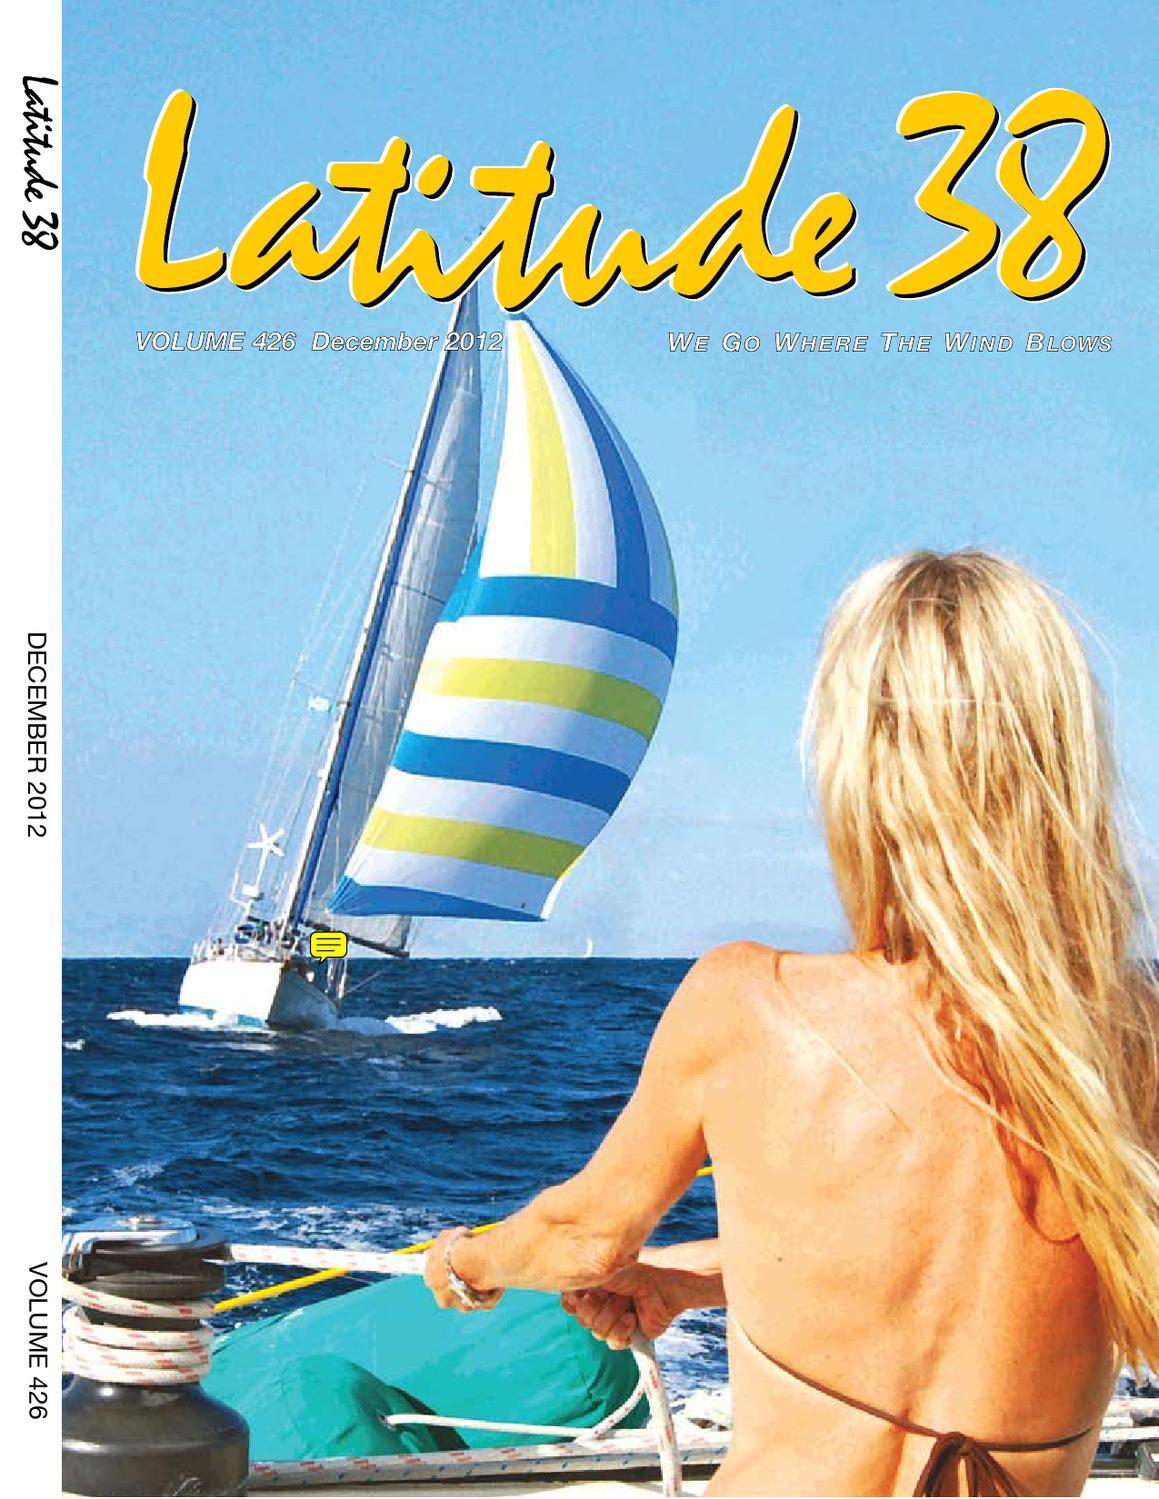 Latitude 38 dec 2012 by latitude 38 media llc issuu fandeluxe Images